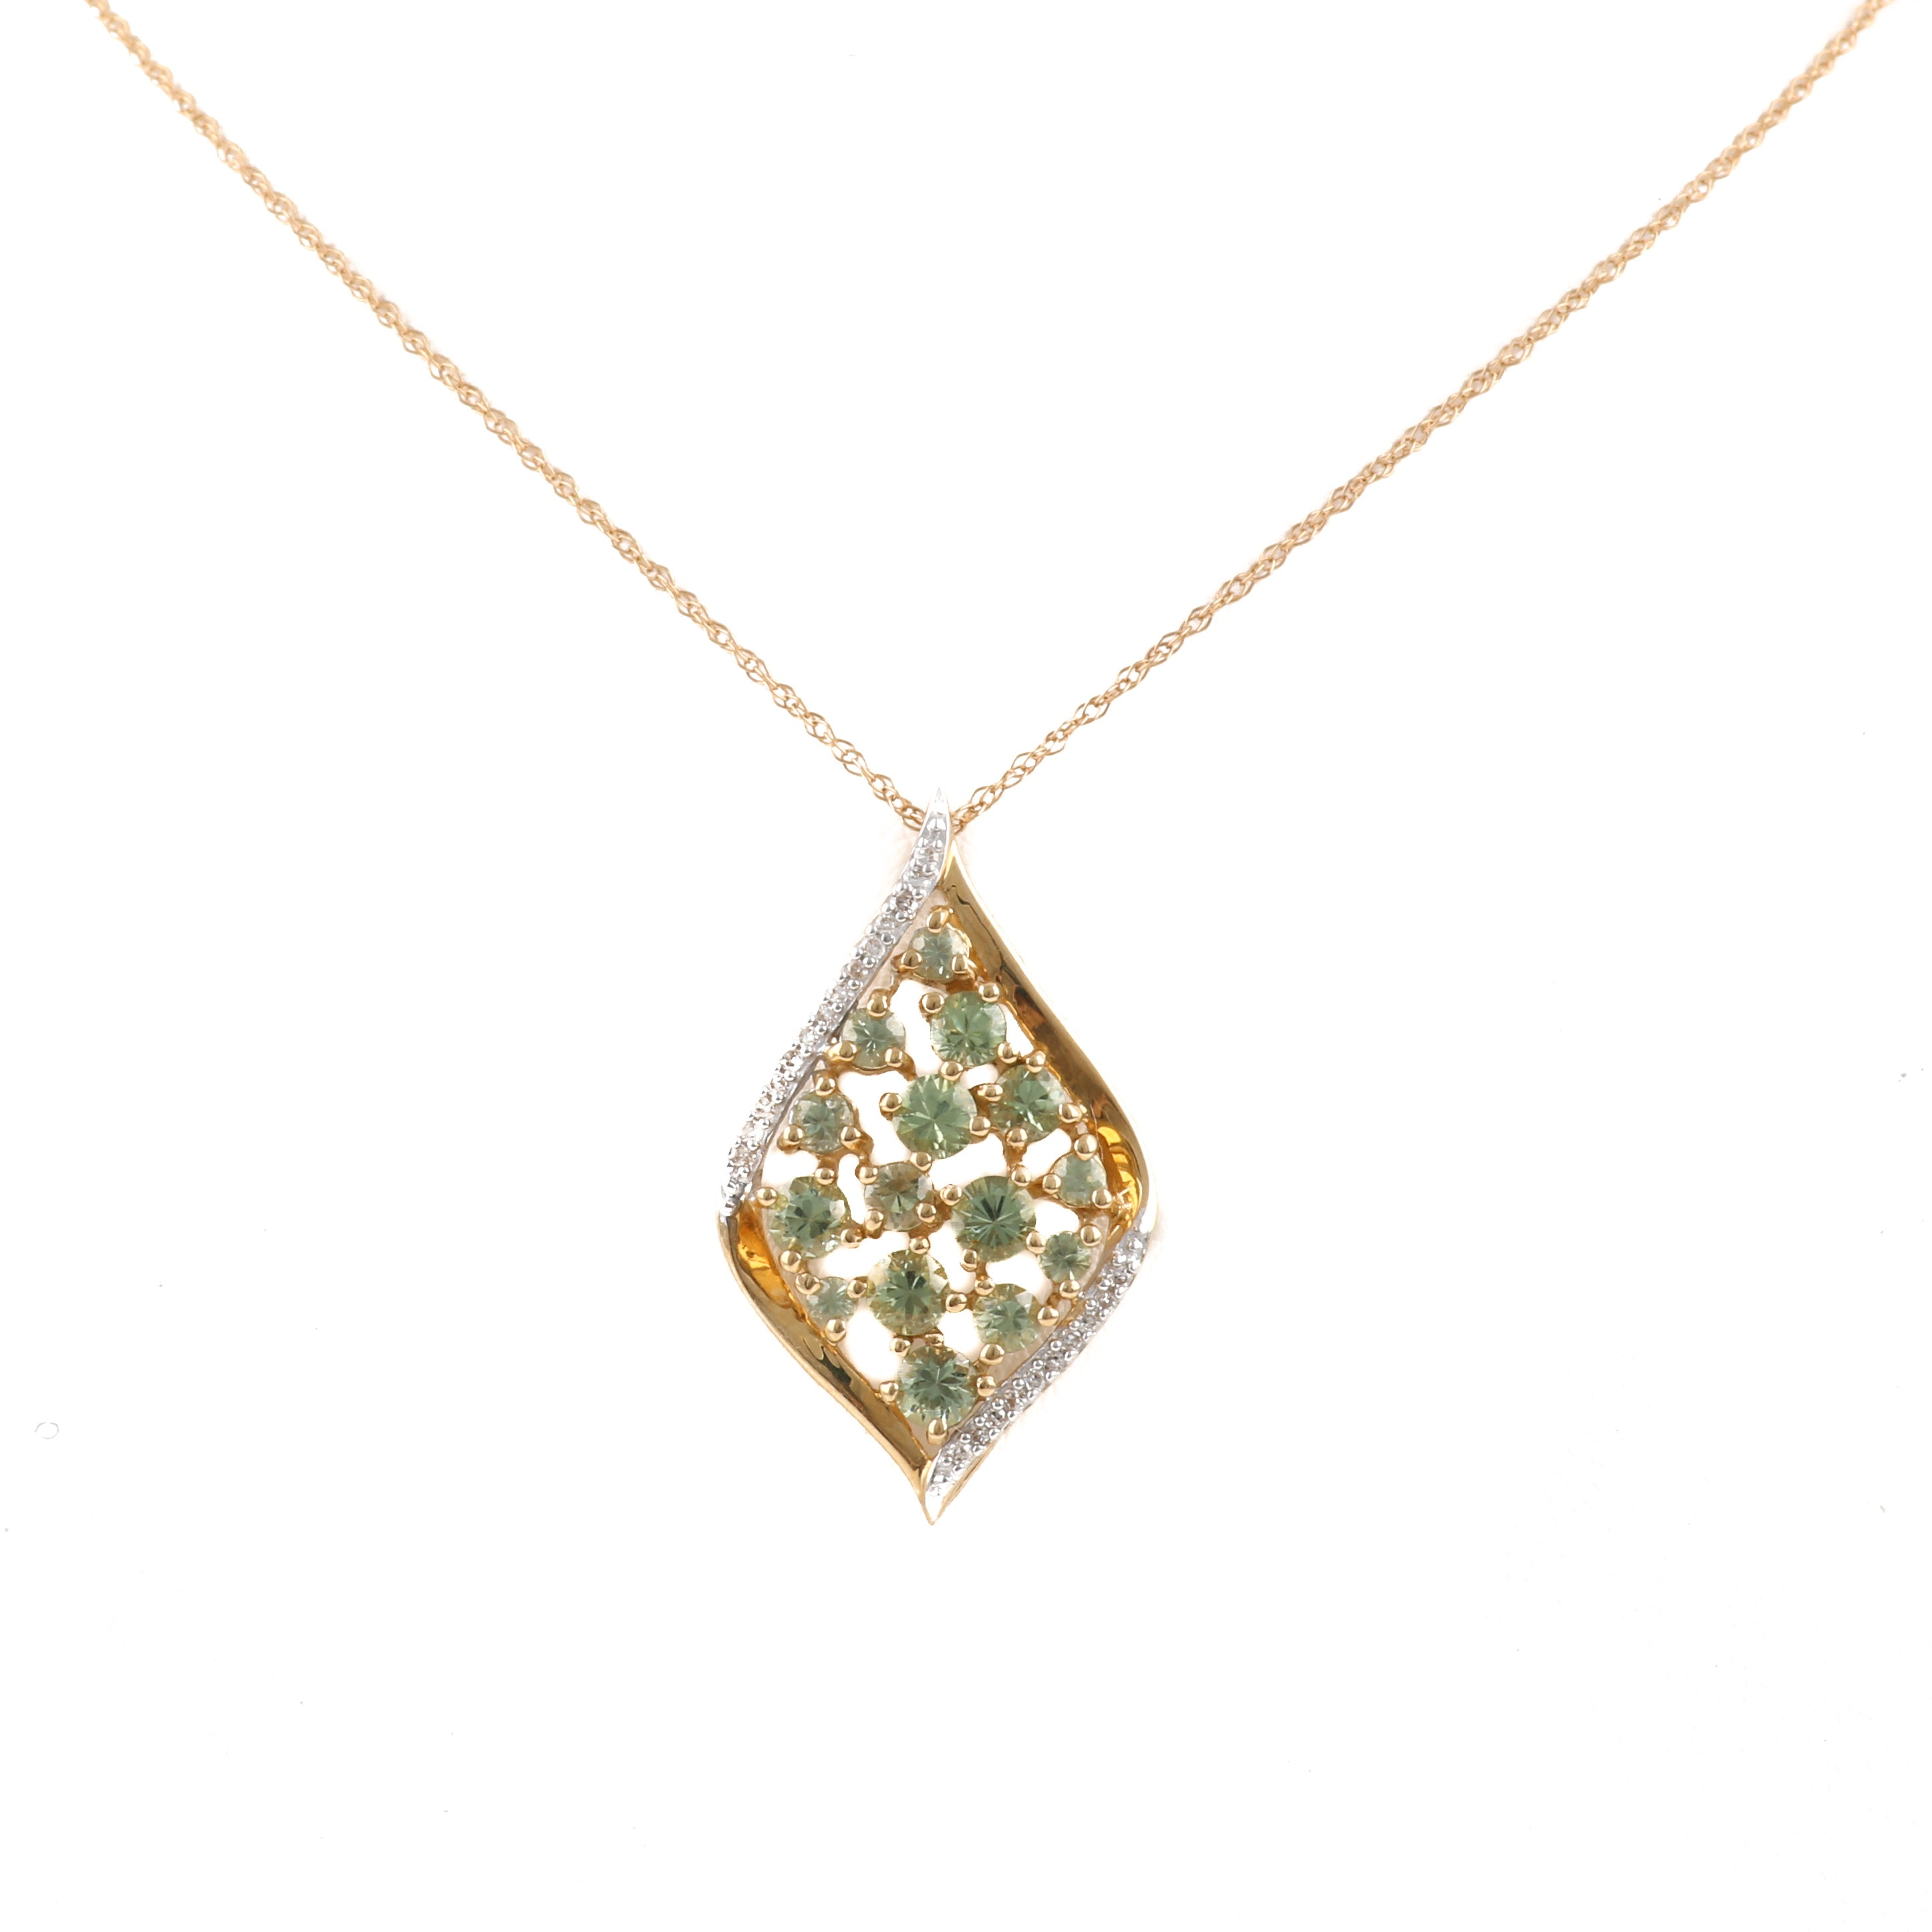 Alwand Vahan 14K Yellow Gold Chrysoberyl and Diamond Necklace